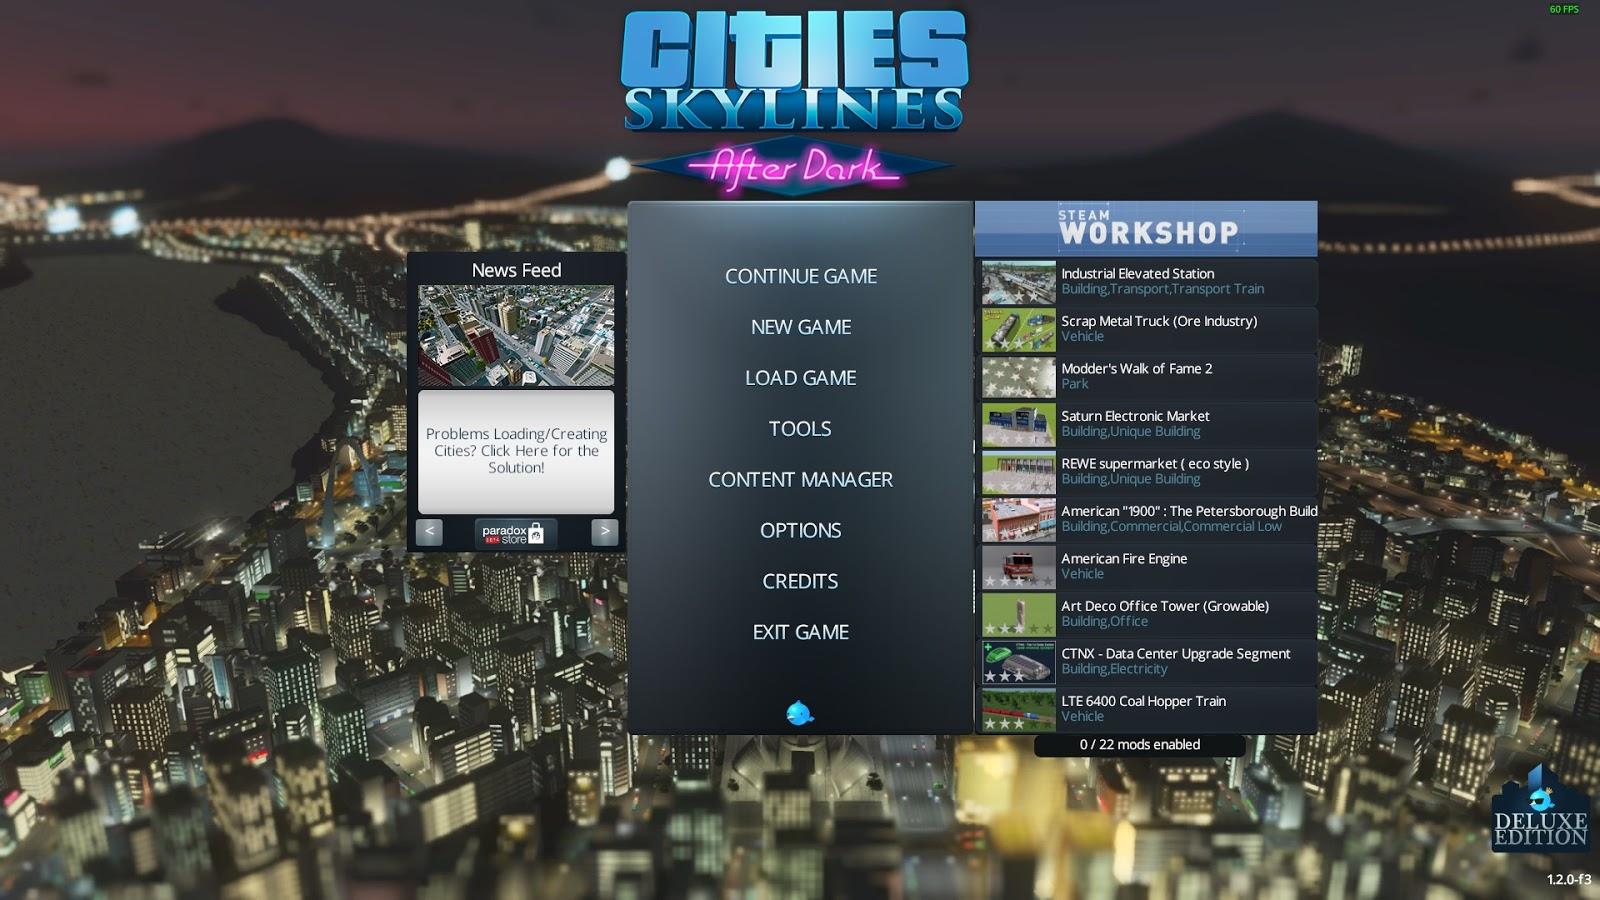 [遊戲] Cities: Skylines 天際線 MOD 分享 - 【-Ma の 筆記本-】